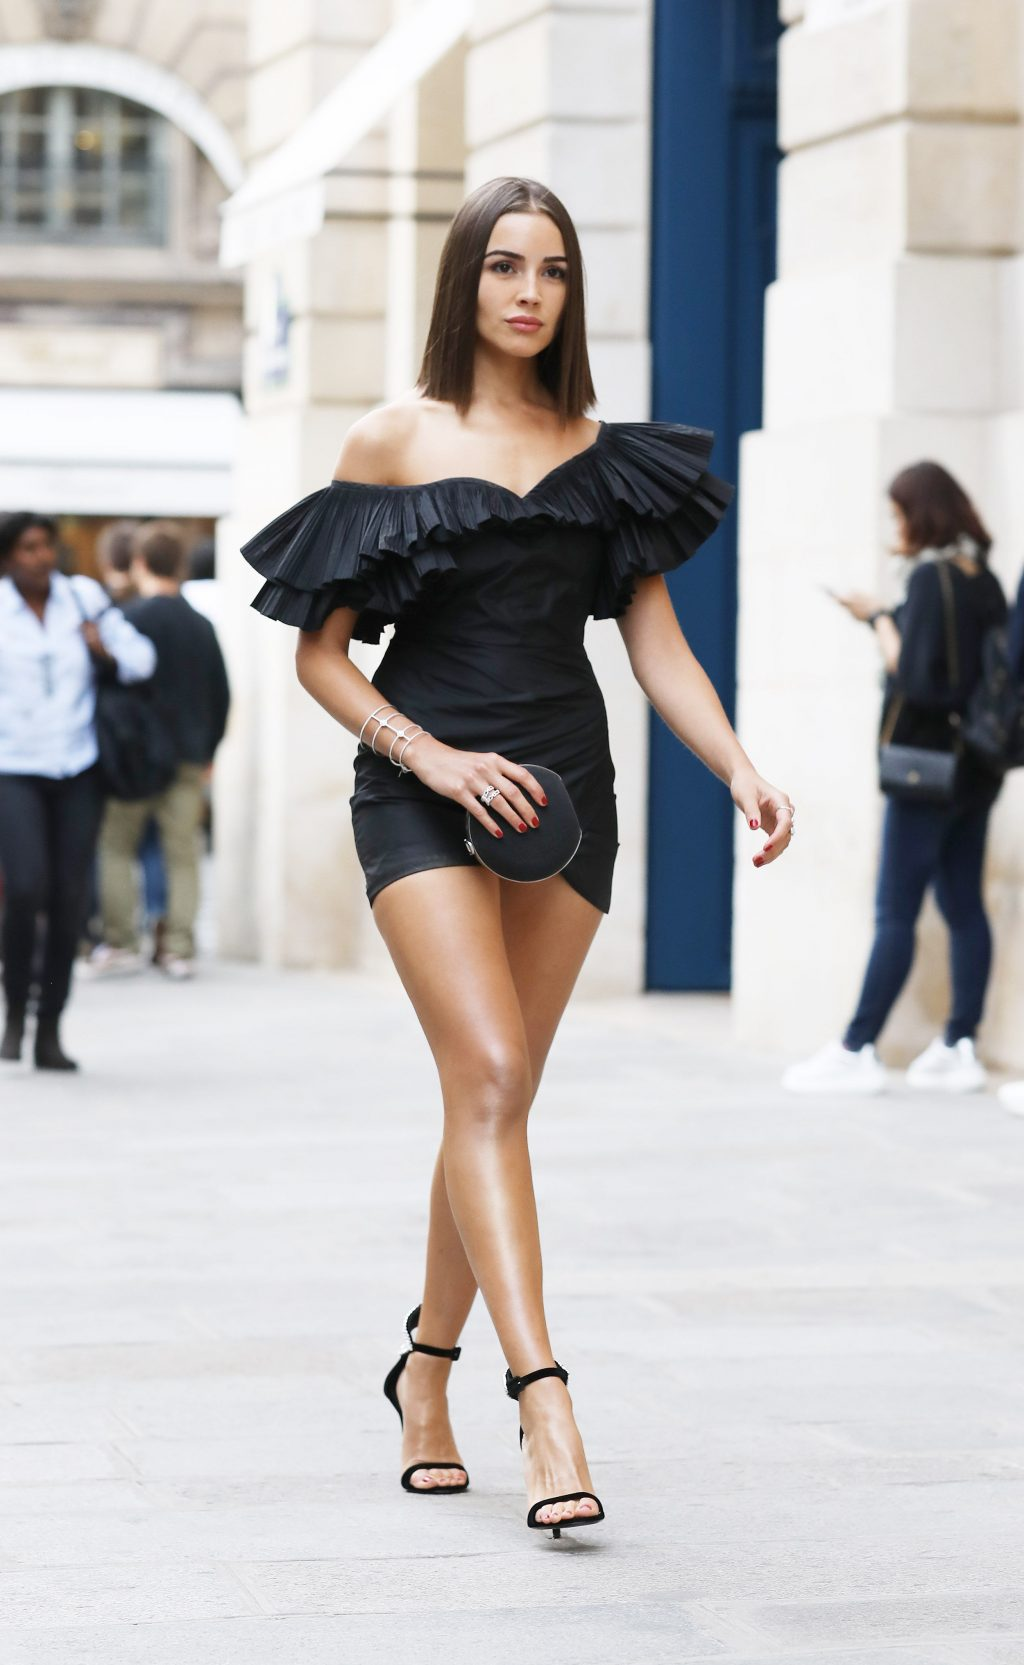 Dani Thorne Sexy Photo. 2018-2019 celebrityes photos leaks! new foto